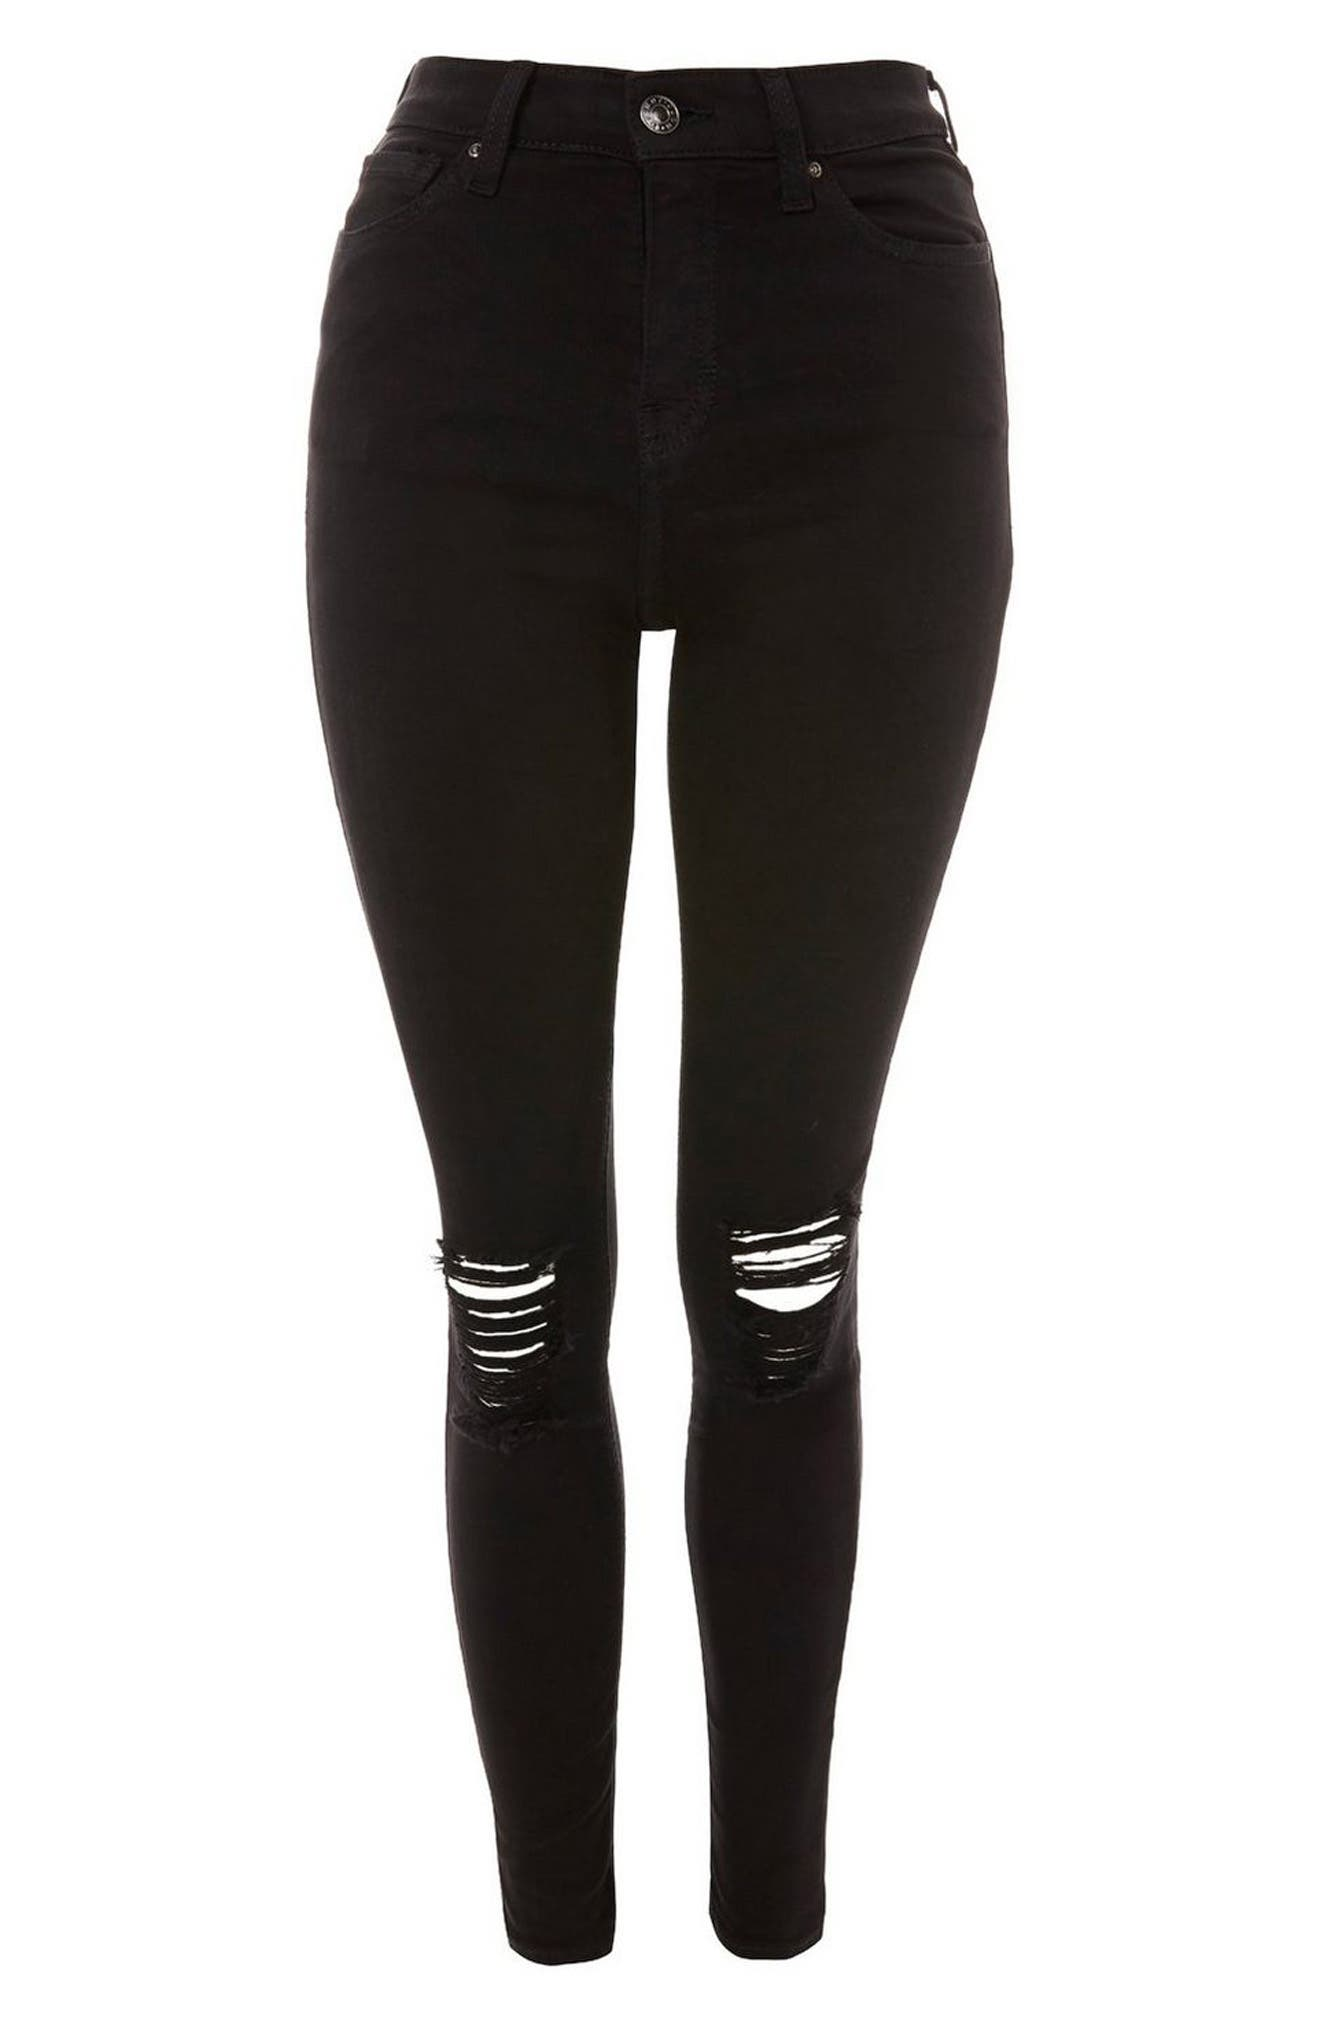 TOPSHOP, Moto Jamie High Waist Ripped Black Jeans, Alternate thumbnail 5, color, BLACK